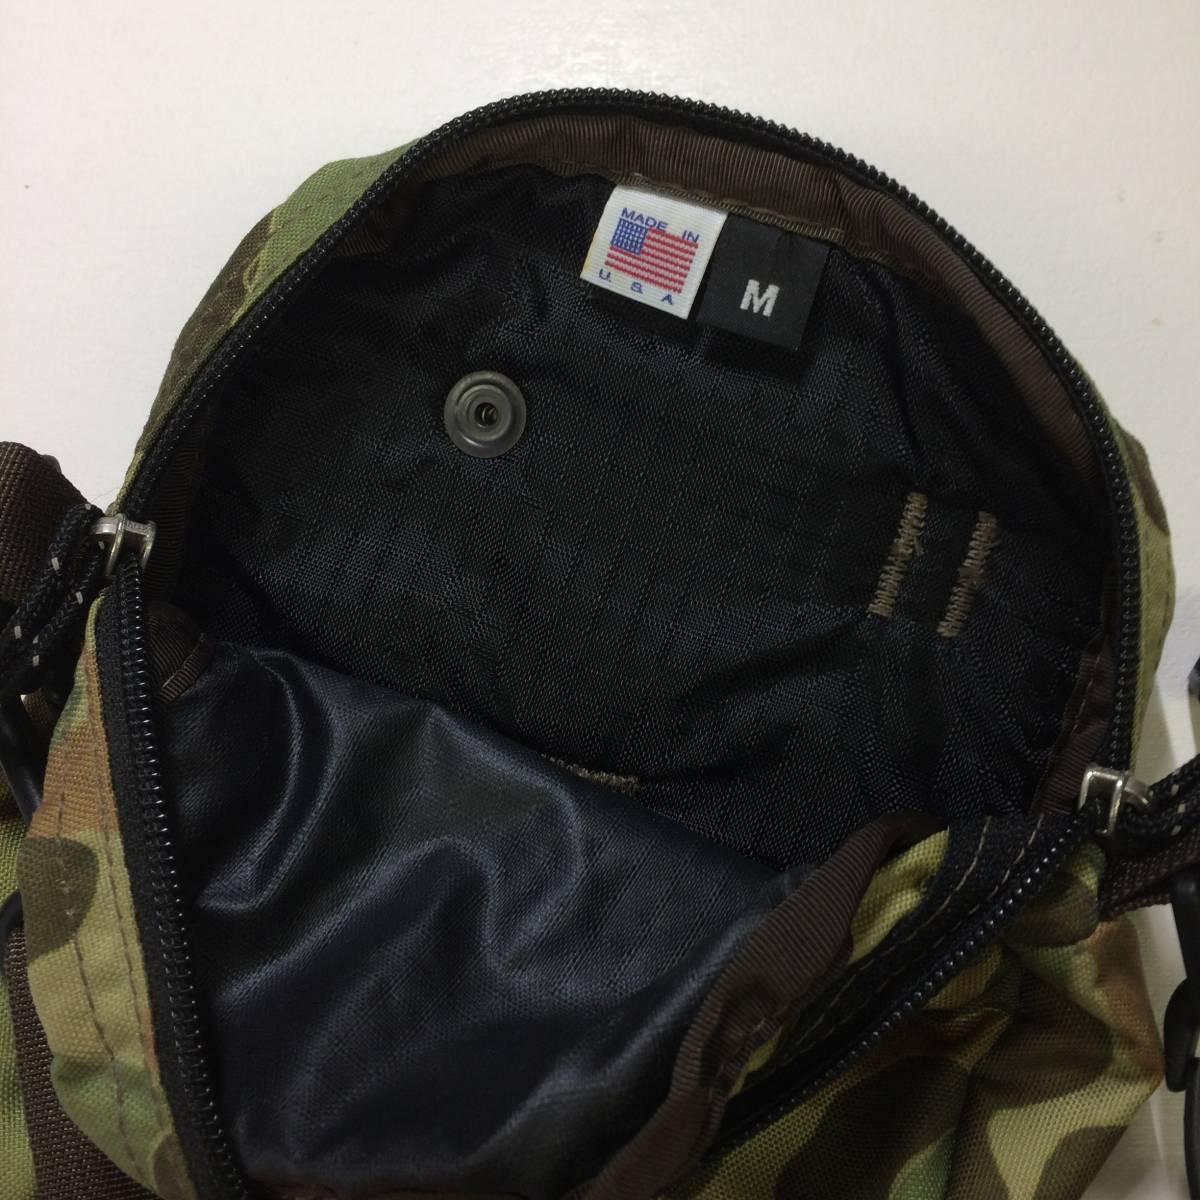 USA製 グレゴリー クイックポケットM ww2 ダックハントカモ 迷彩 ショルダーポーチ ポシェット